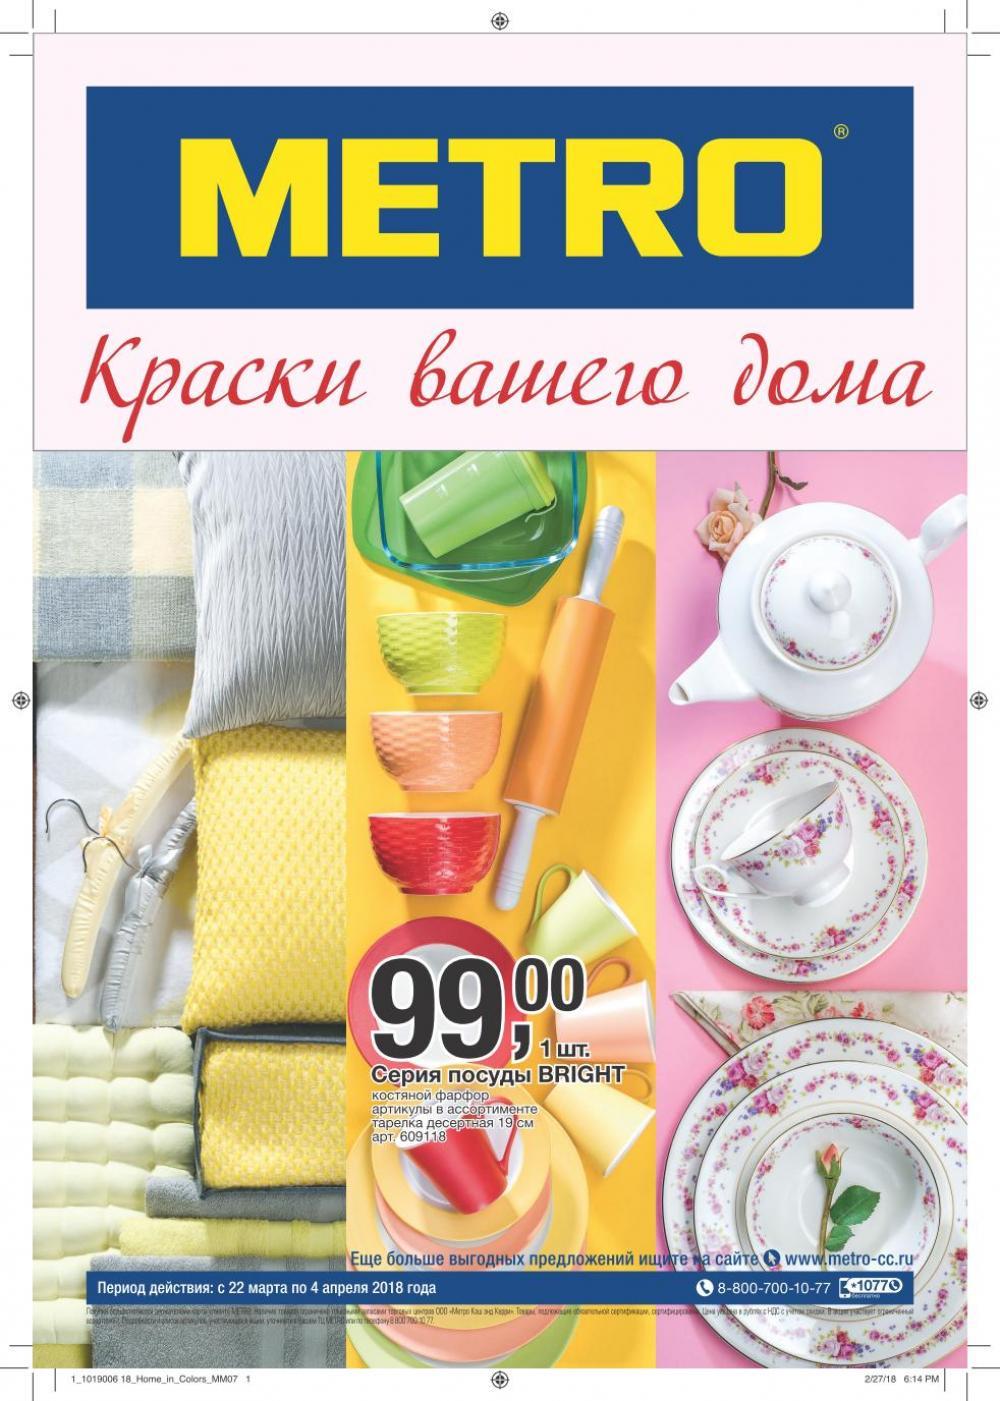 Каталог магазина Метро - товары для дома, с 22 марта 2018